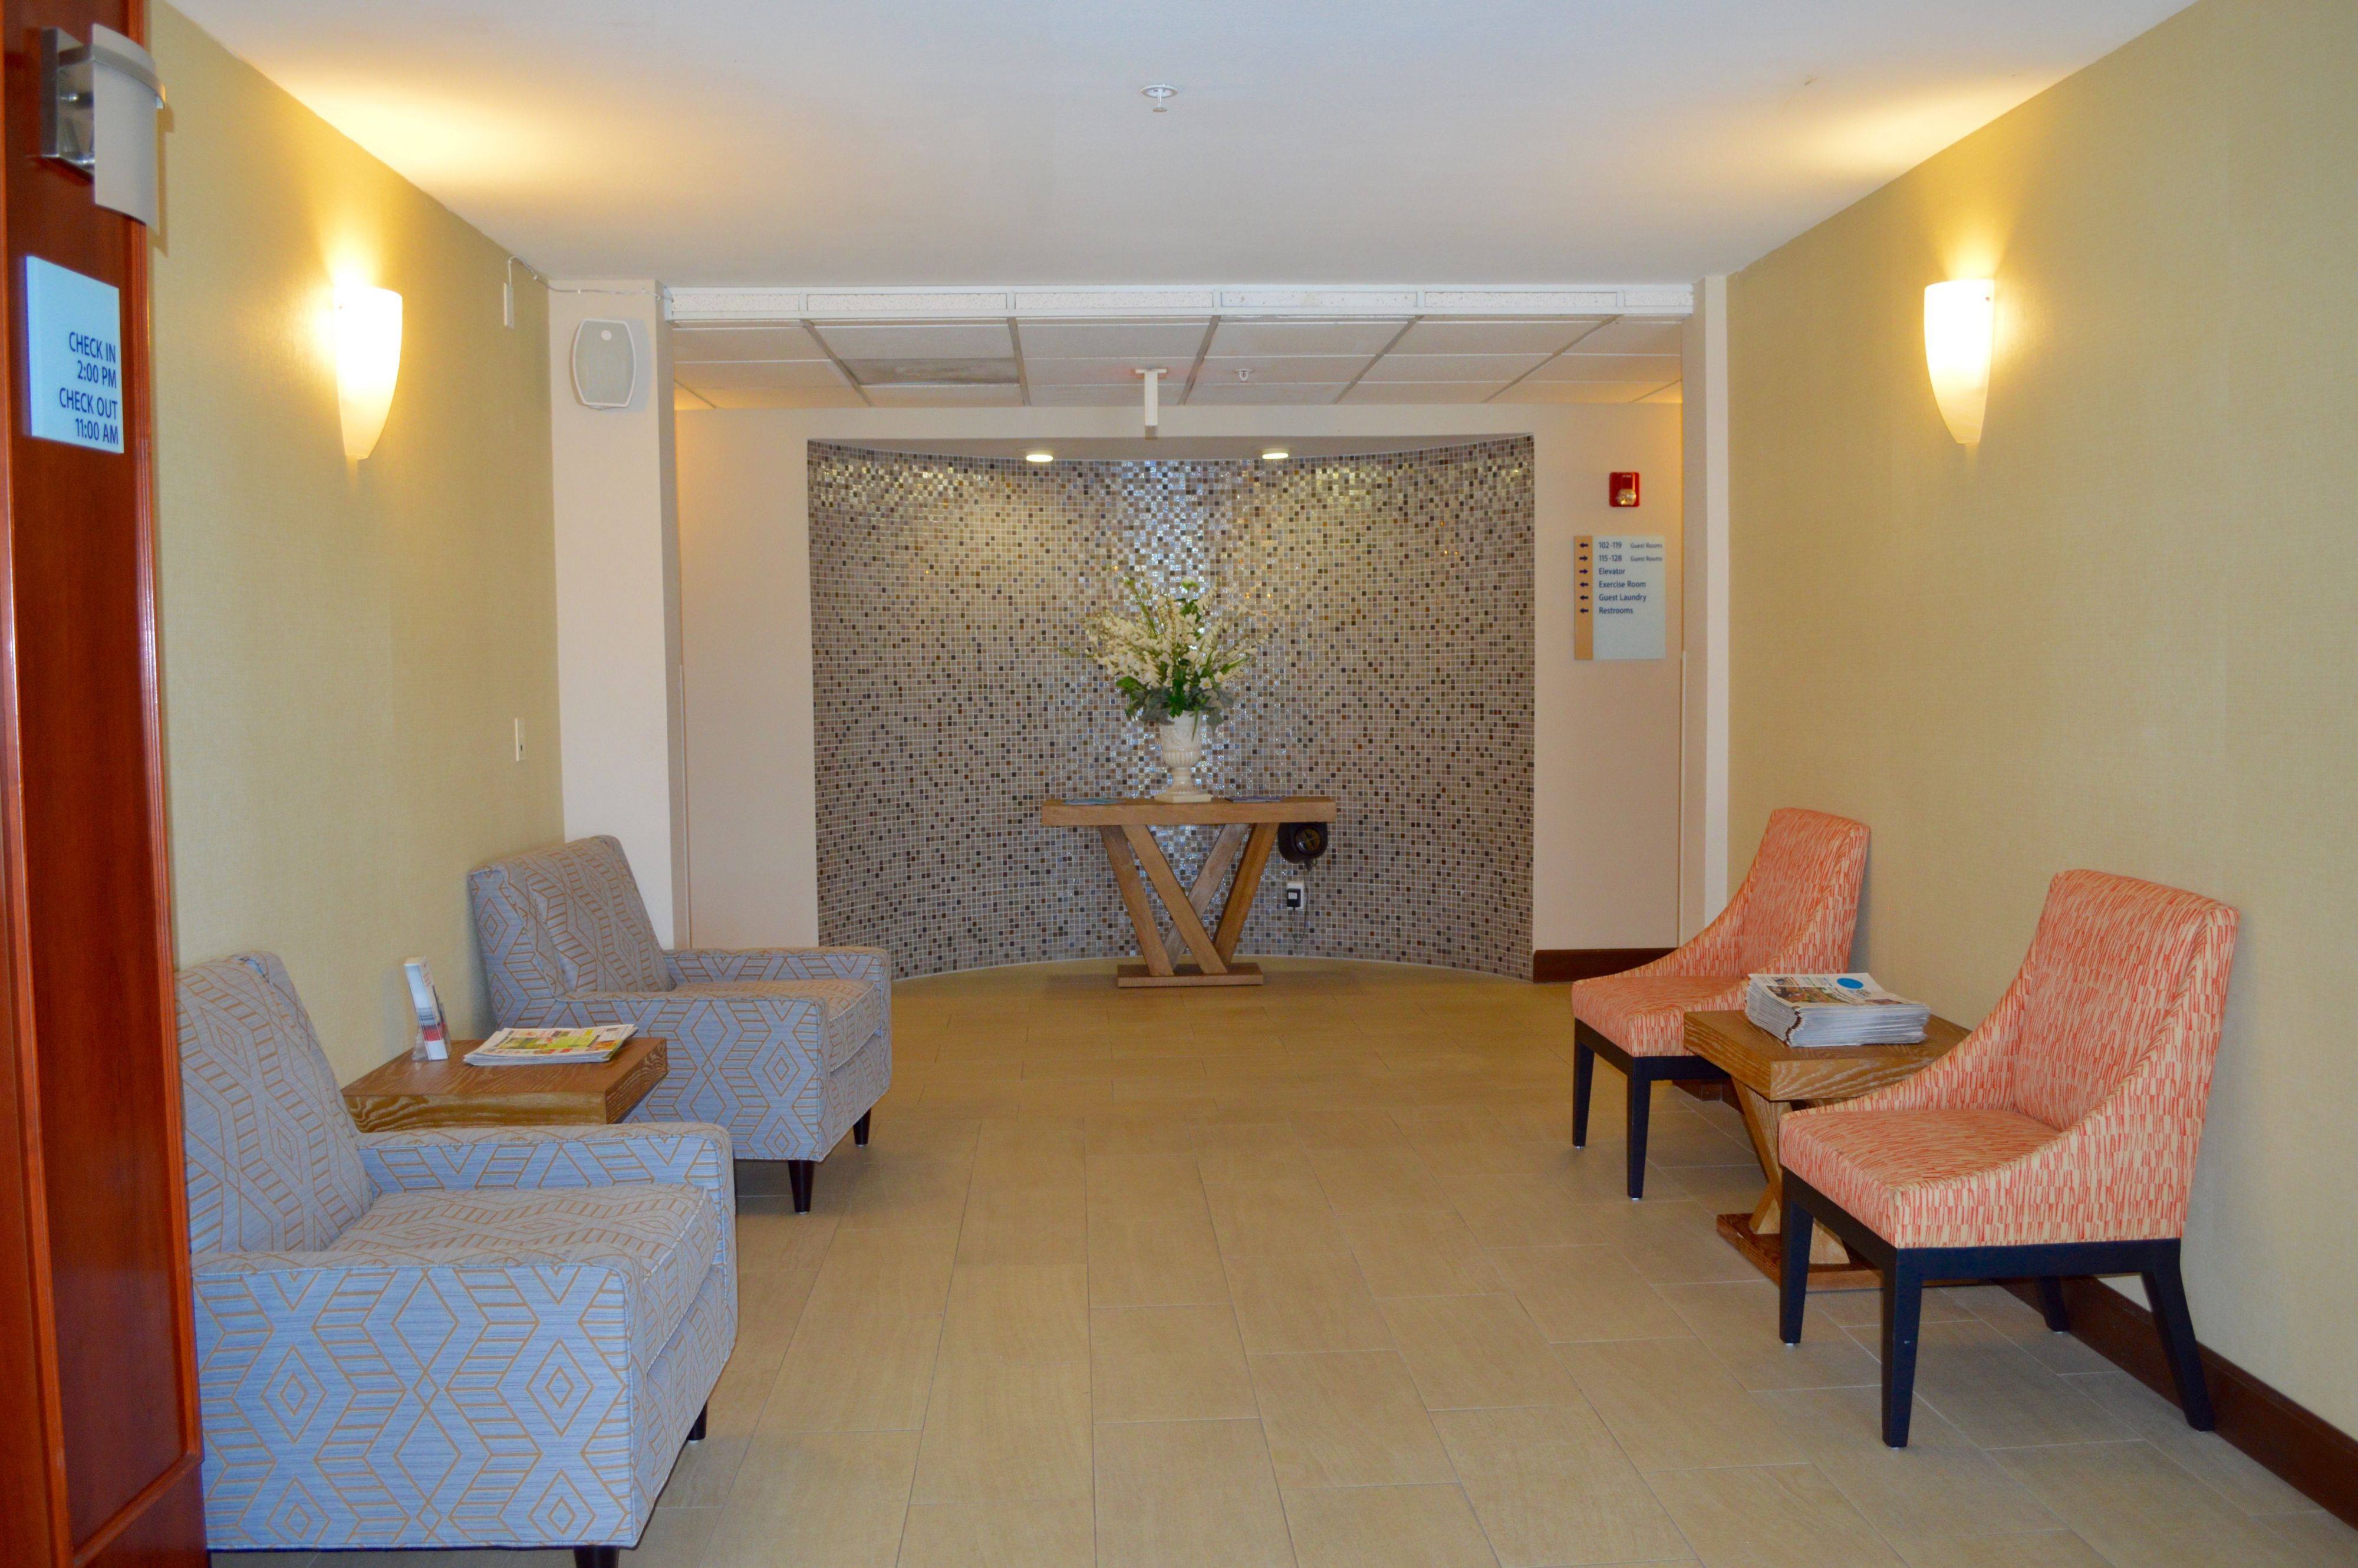 Holiday Inn Express Calexico image 4